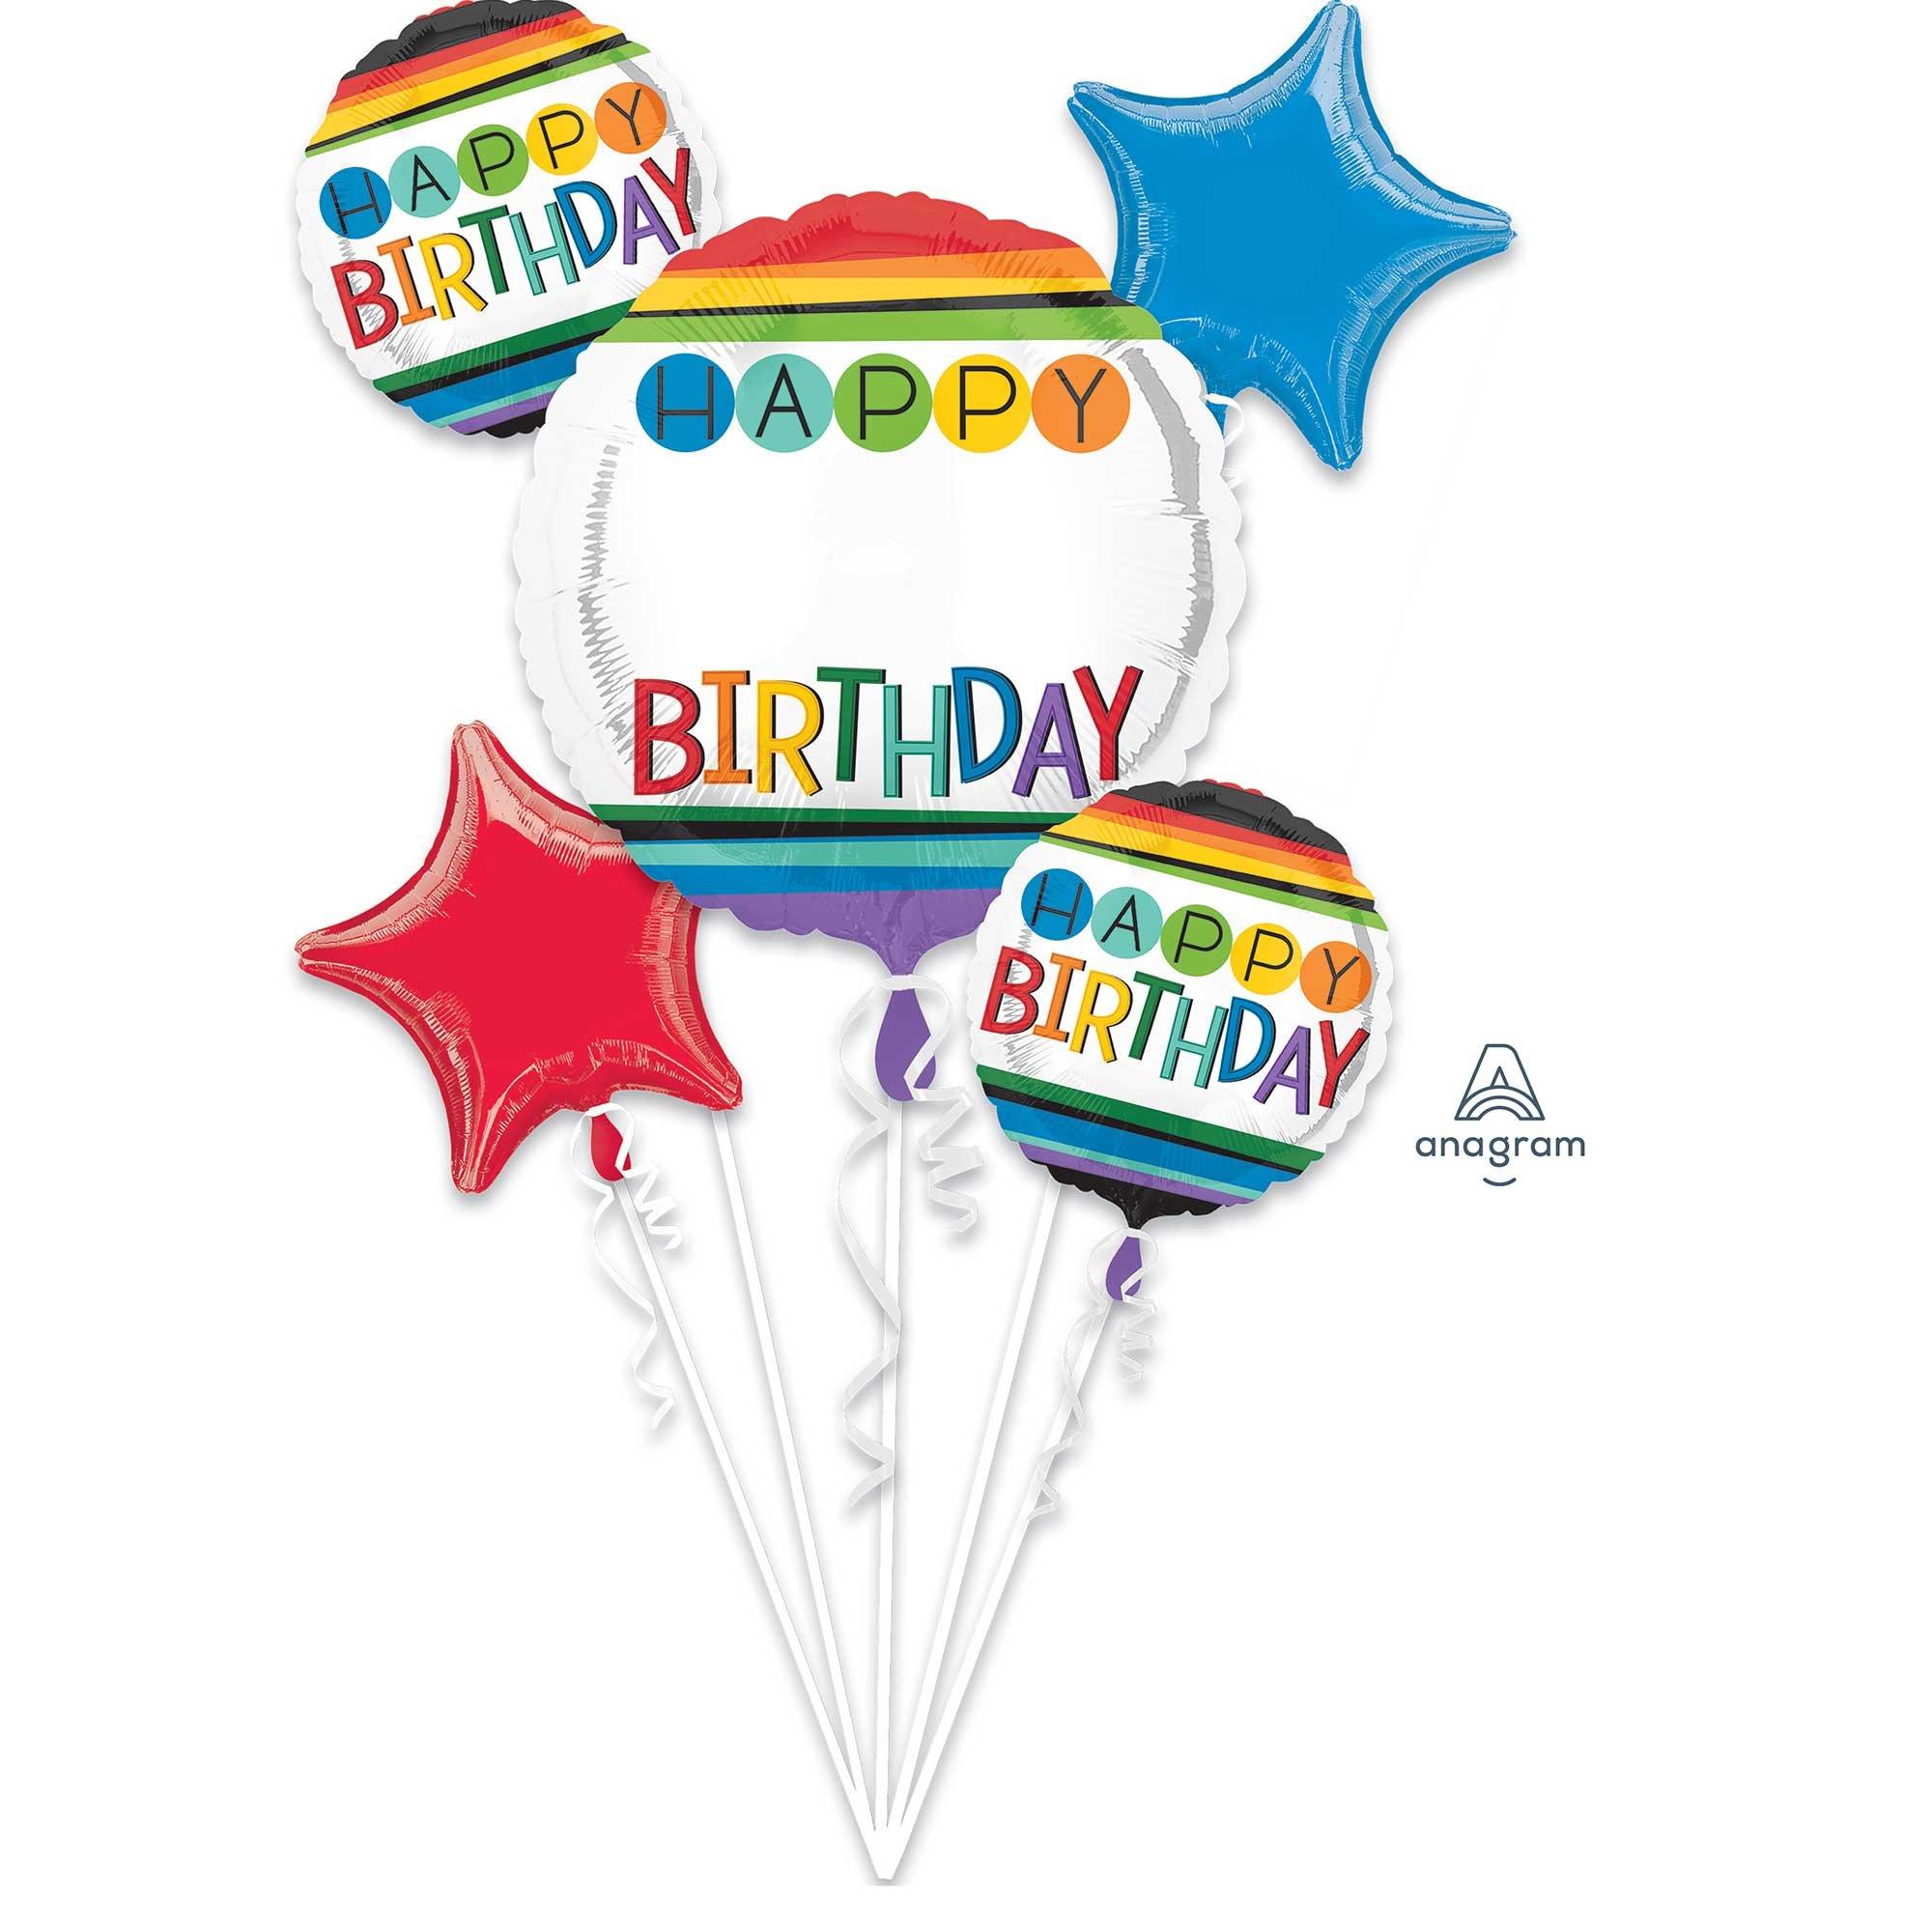 Bouquet Personalized Rainbow Happy Birthday Personalize It! P90